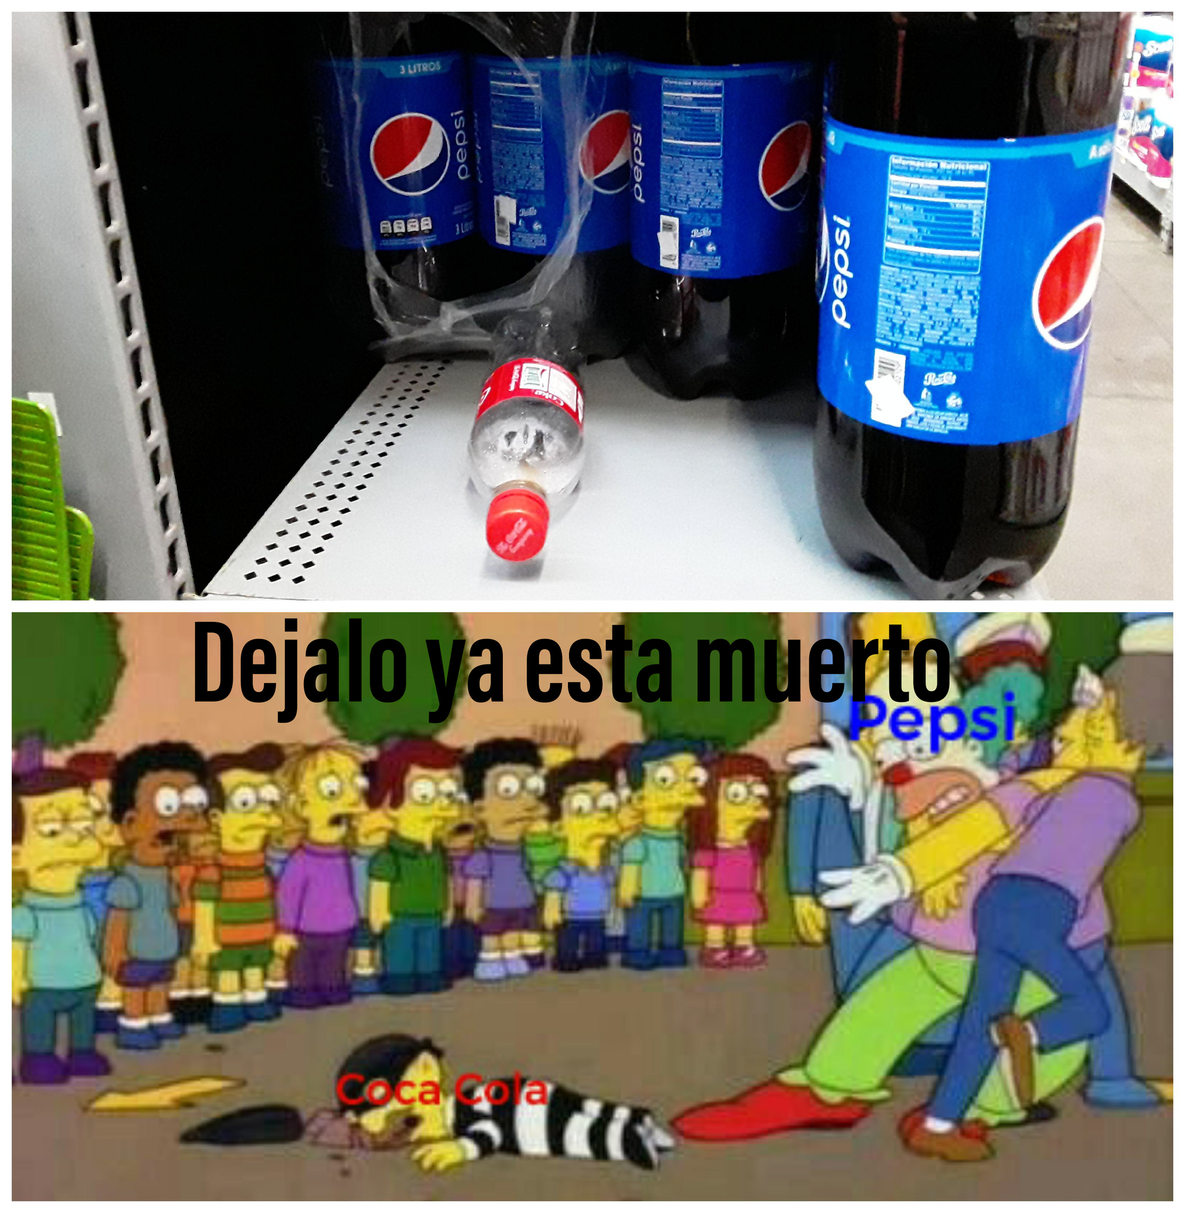 Pepsi wins - meme